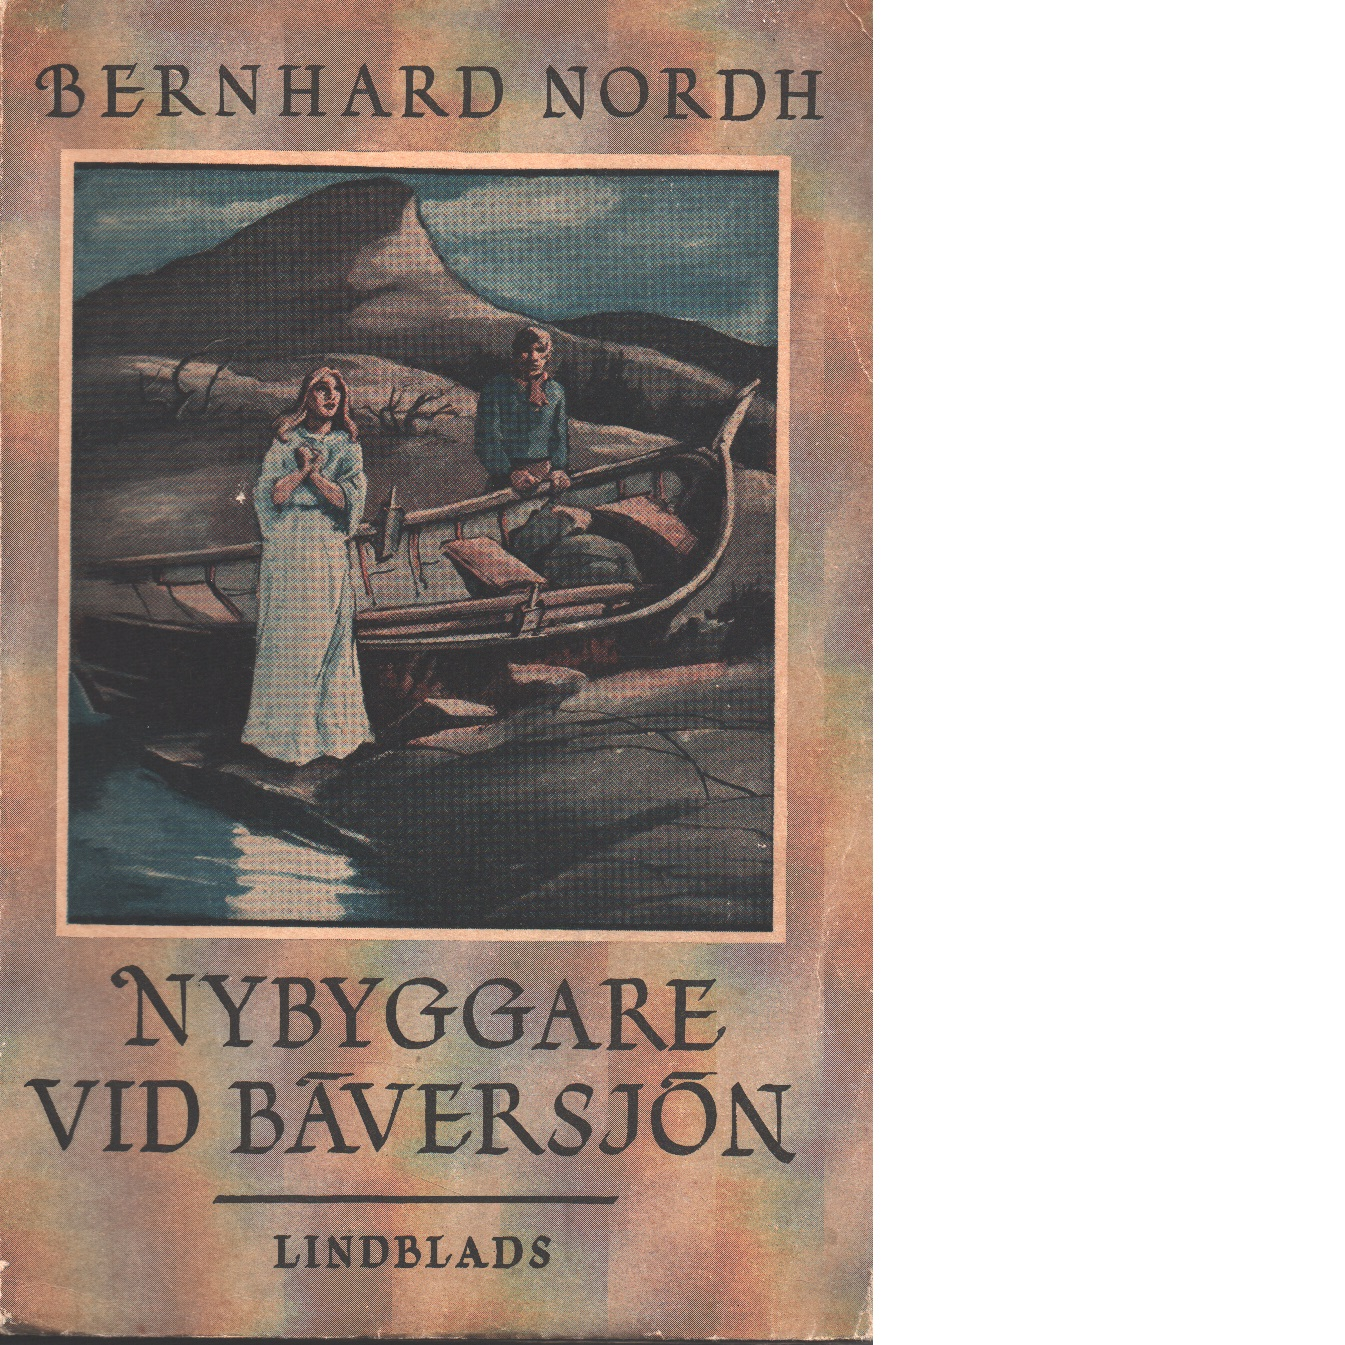 Nybyggare  vid Bäversjön - Nordh, Bernhard